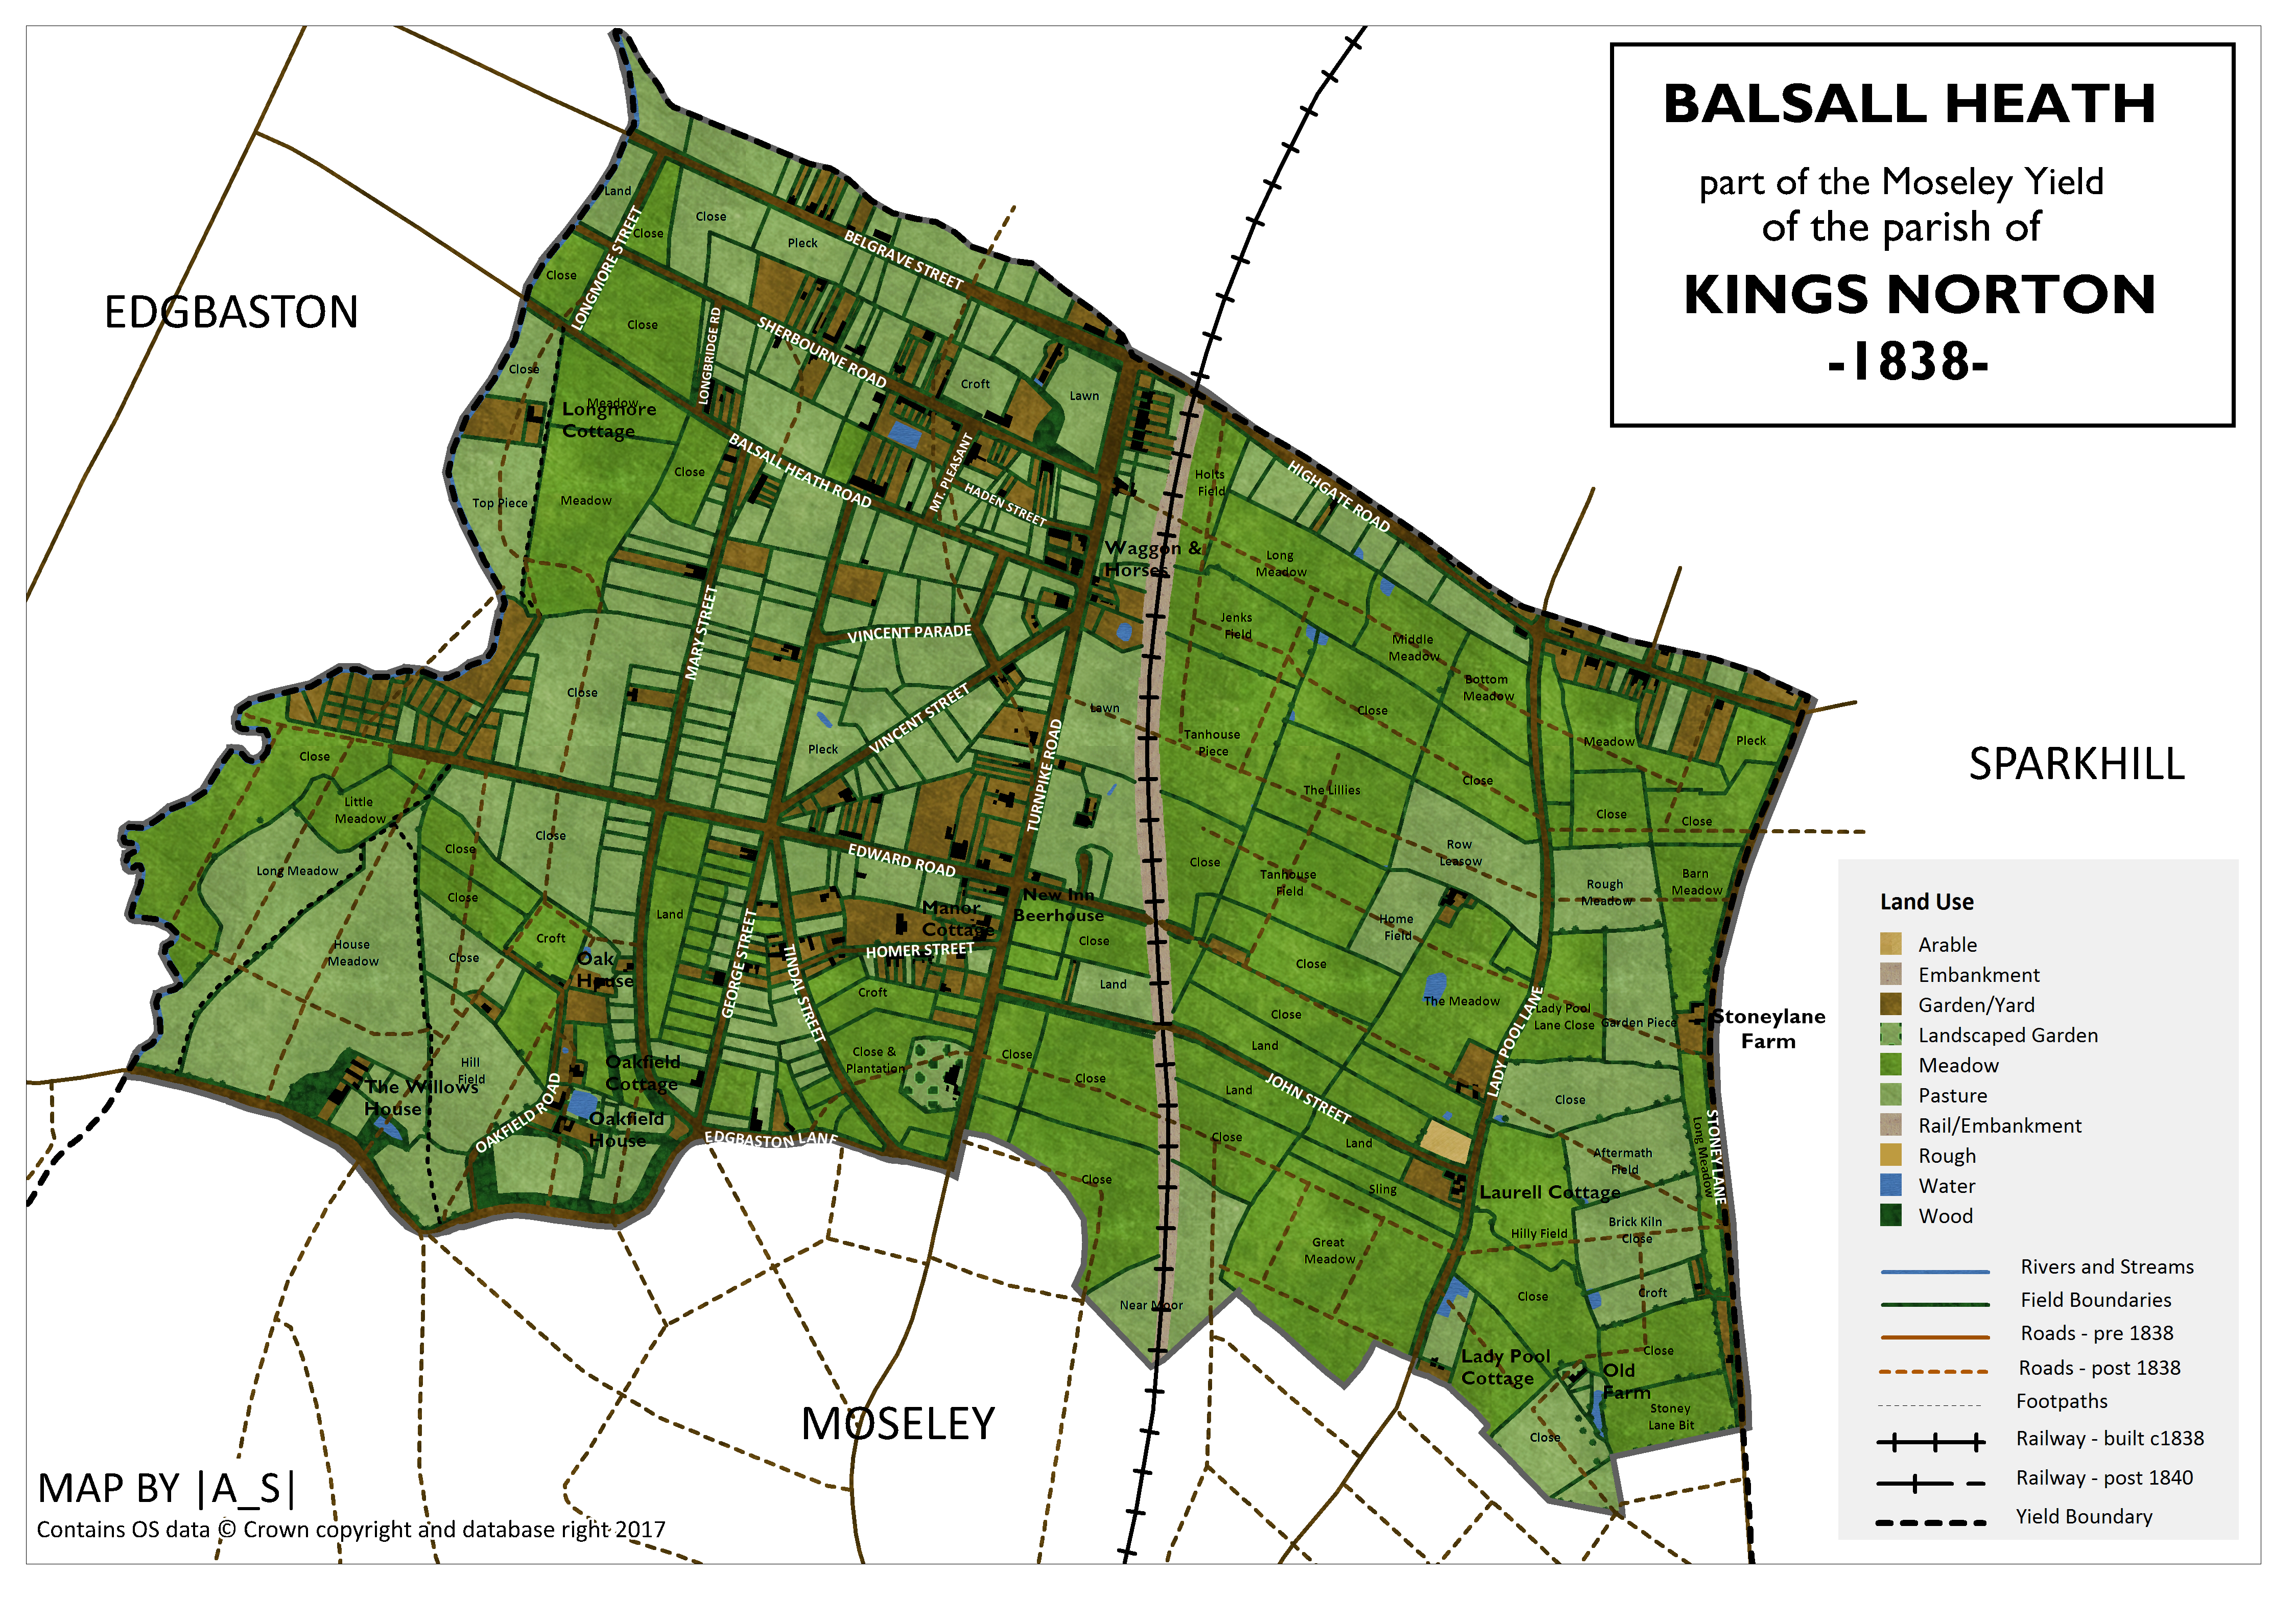 Balsall Heath 1838